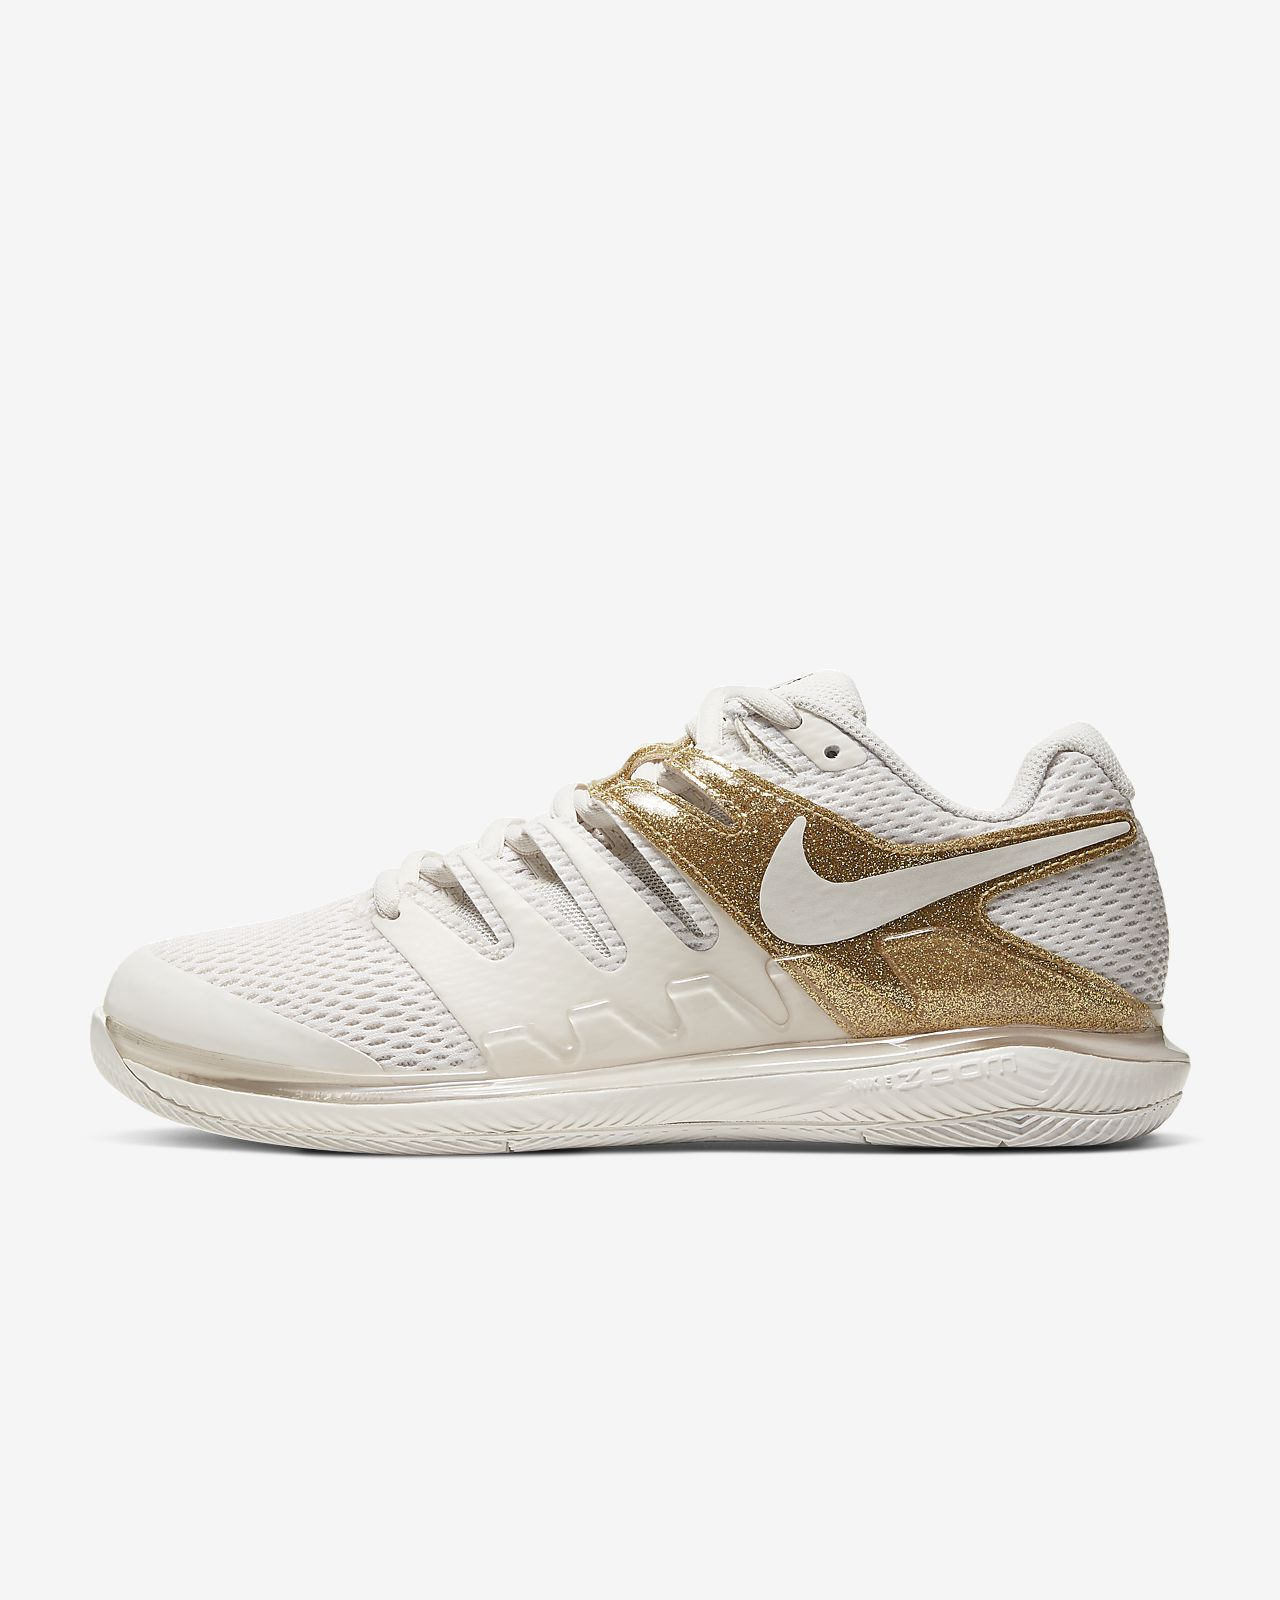 First Look: Nike Zoom Vapor X Knit Tennis Shoe